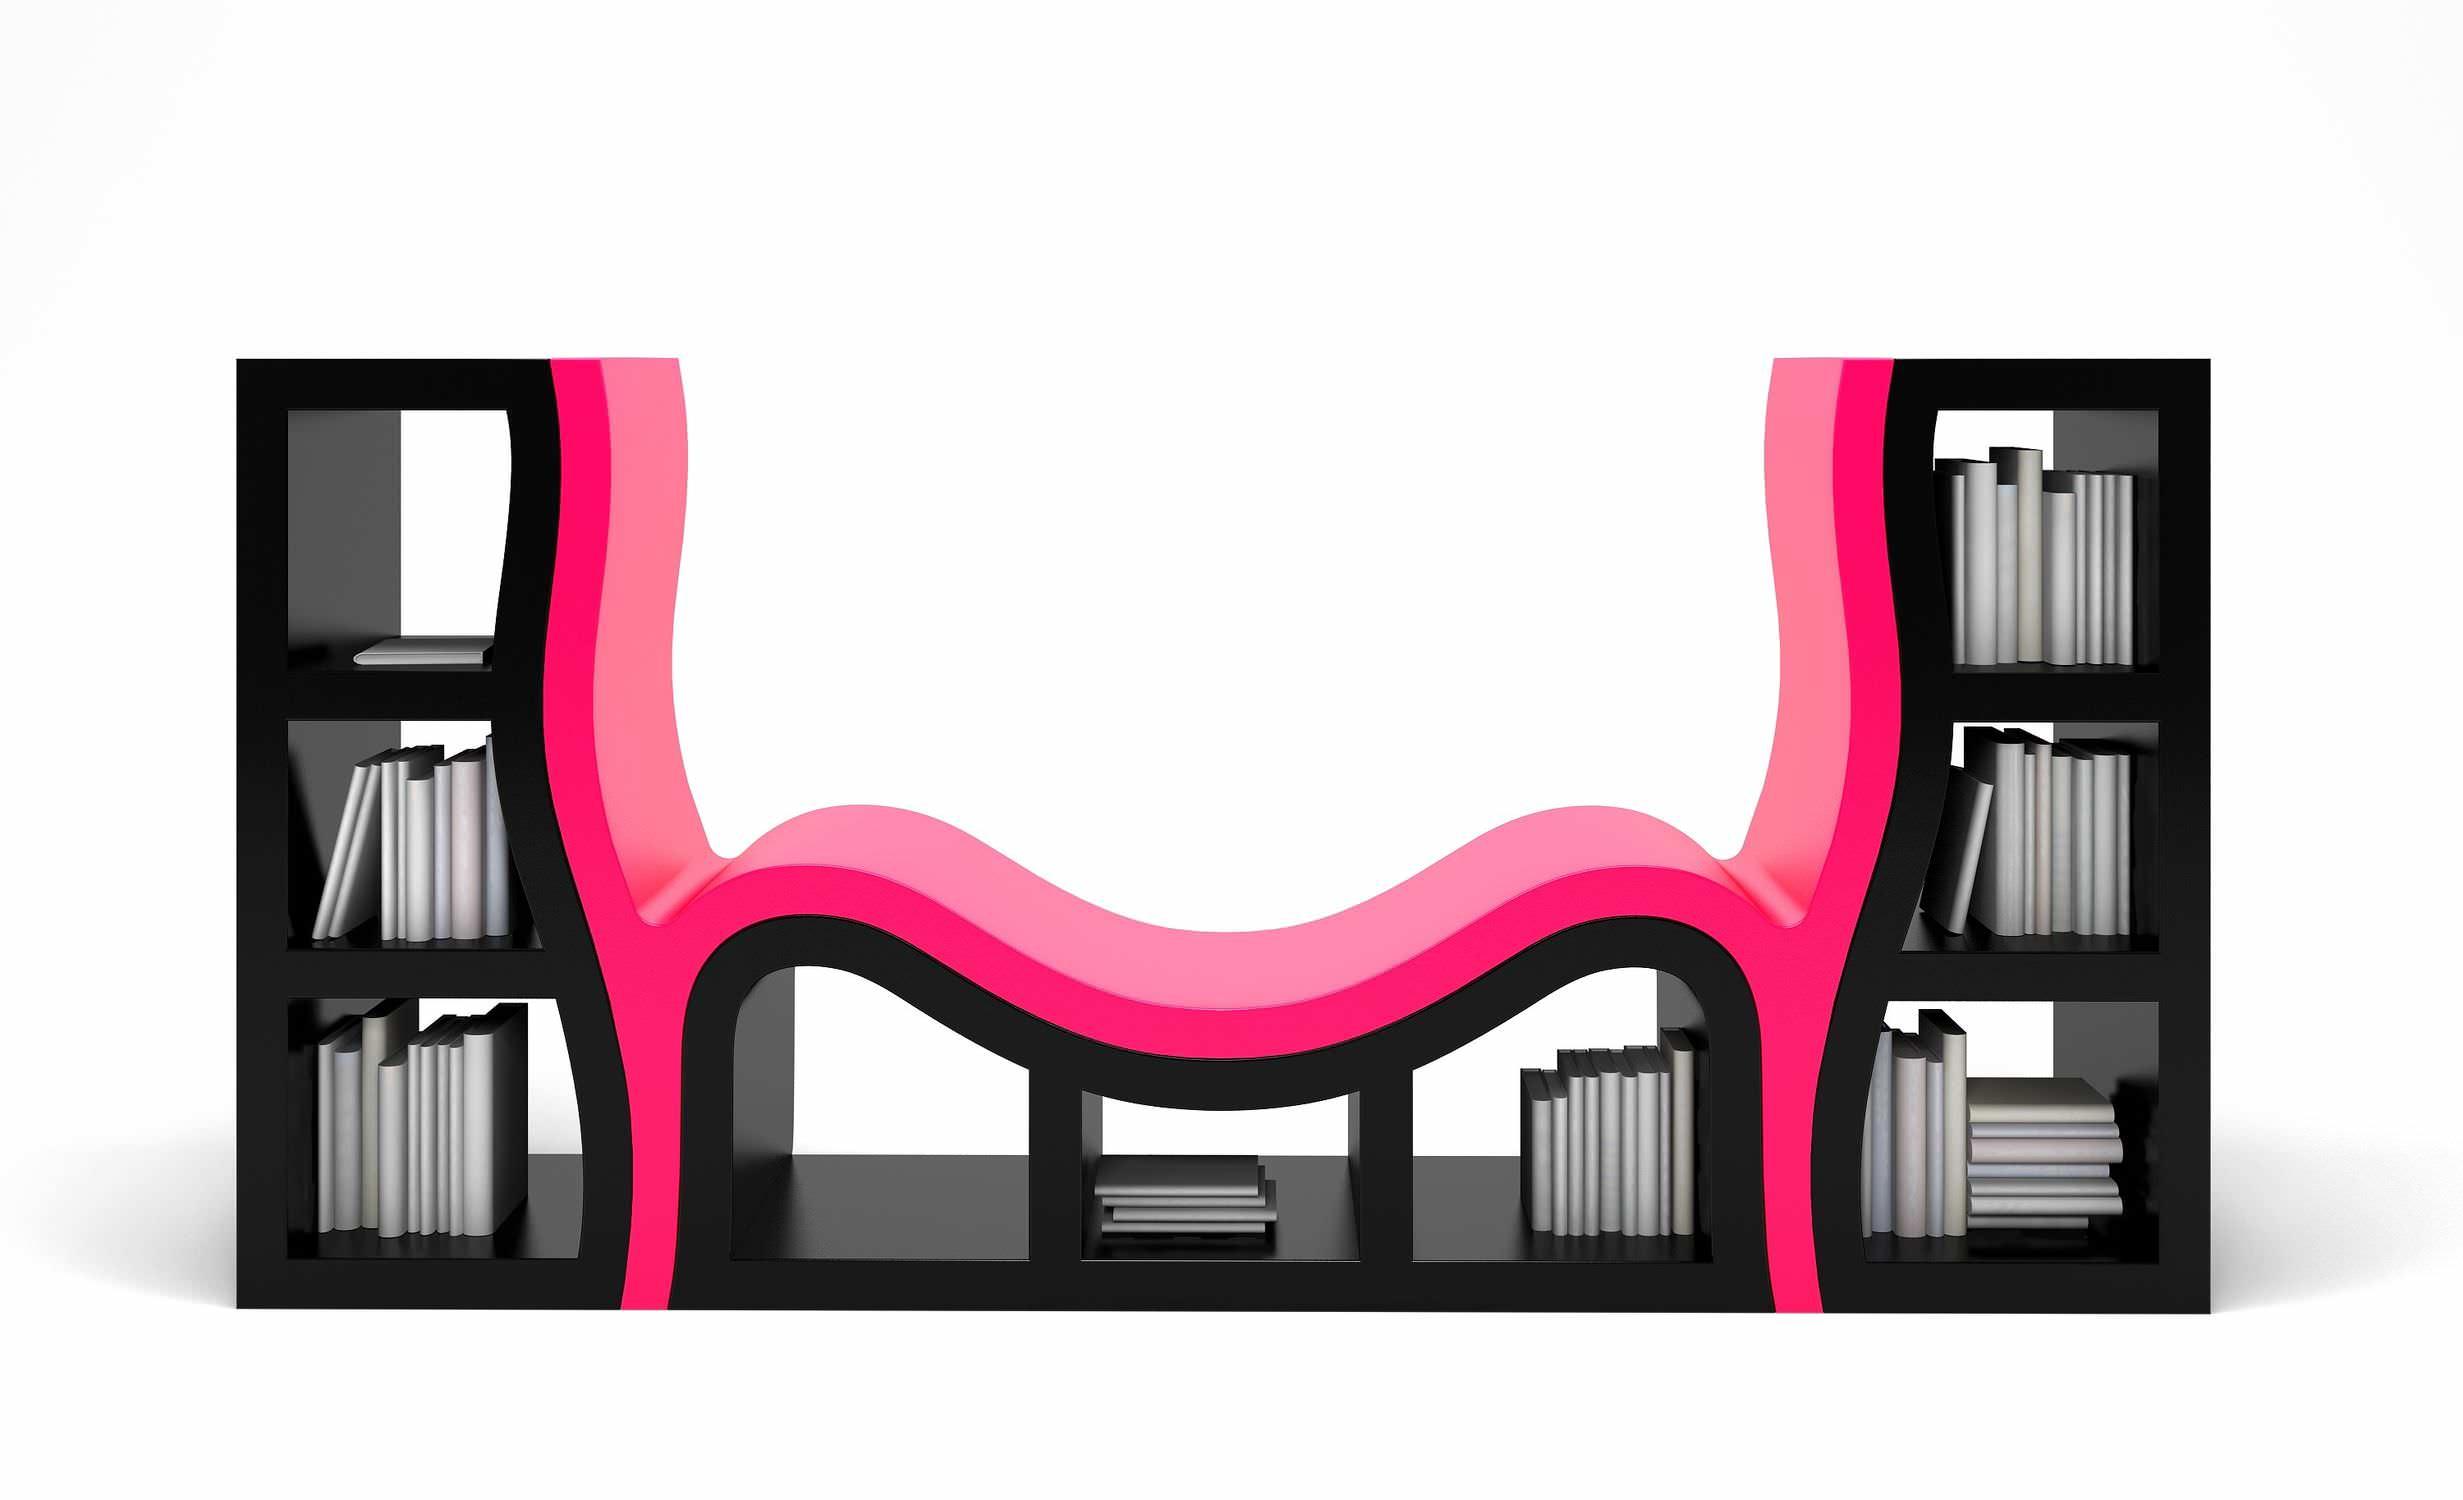 bibliotheques-design-pop-64312-2114405